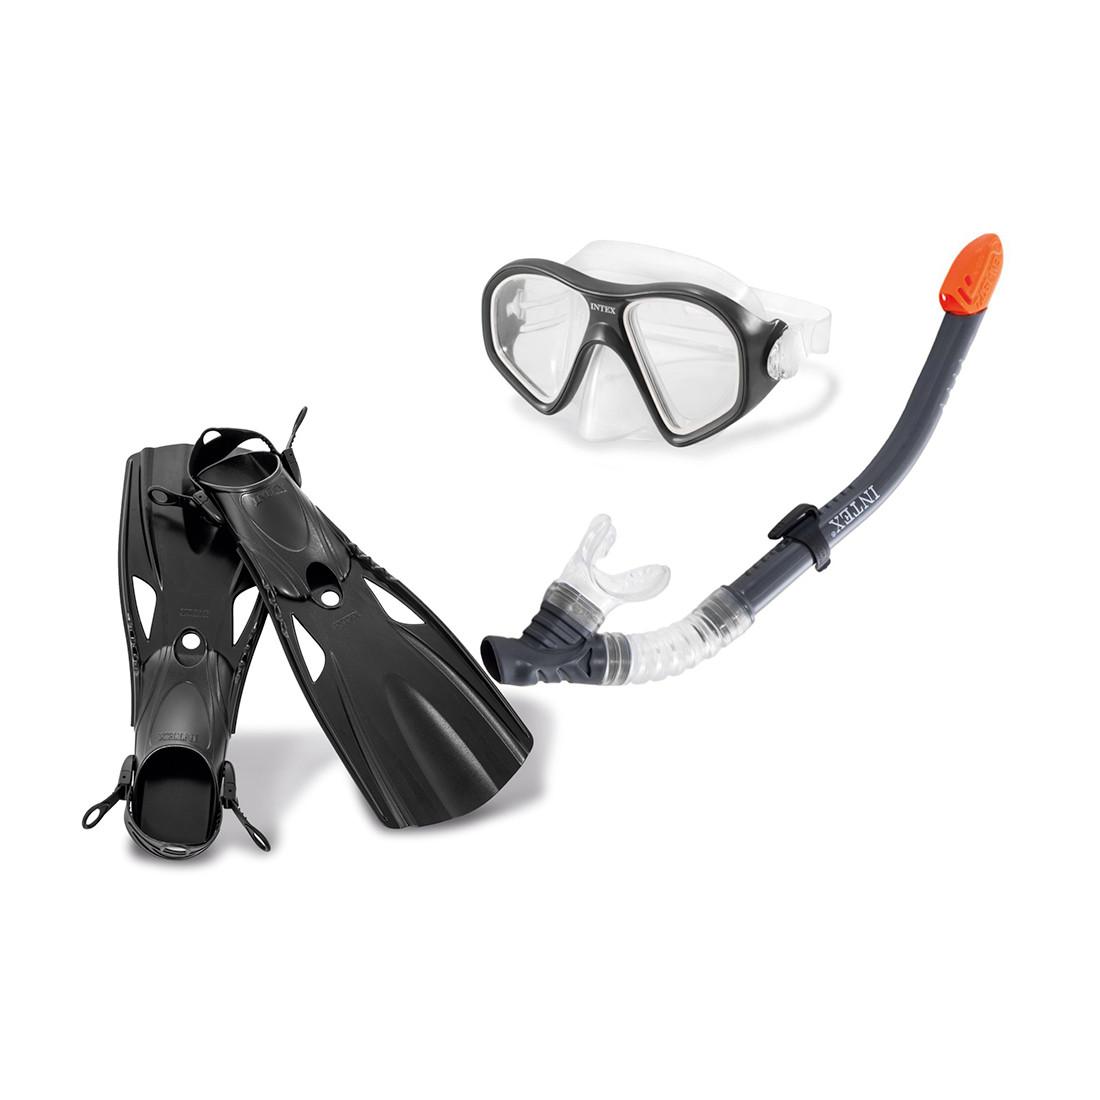 Набор для плавания INTEX Reef Rider Sports Set 14+ 55658 (Black)